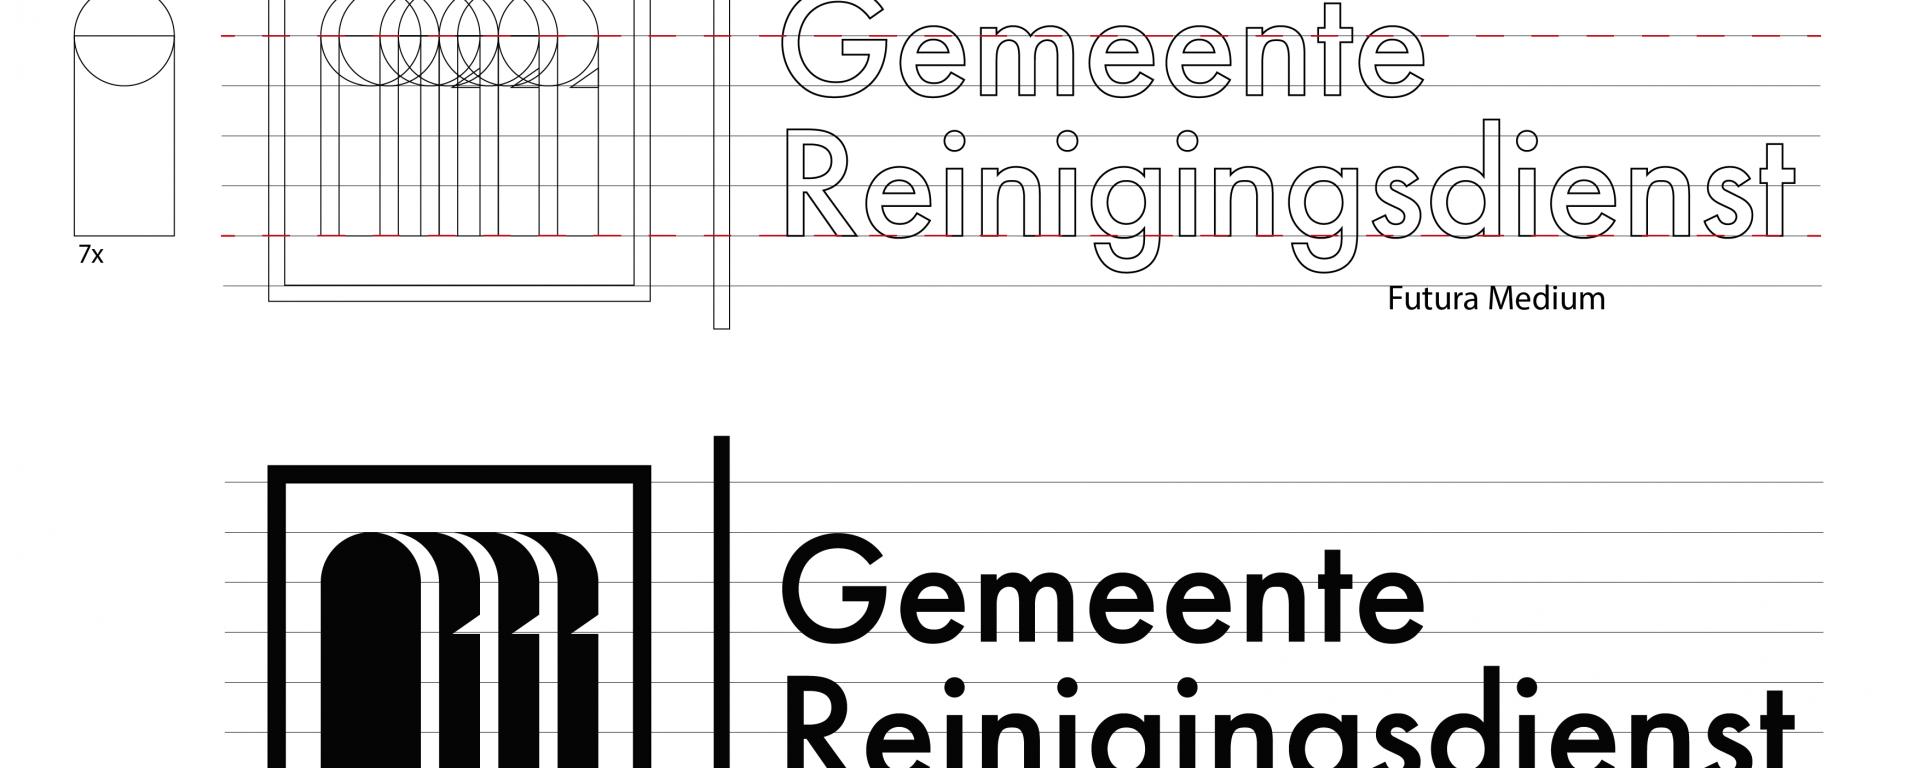 Reinigingsdienst 03 - logo construction